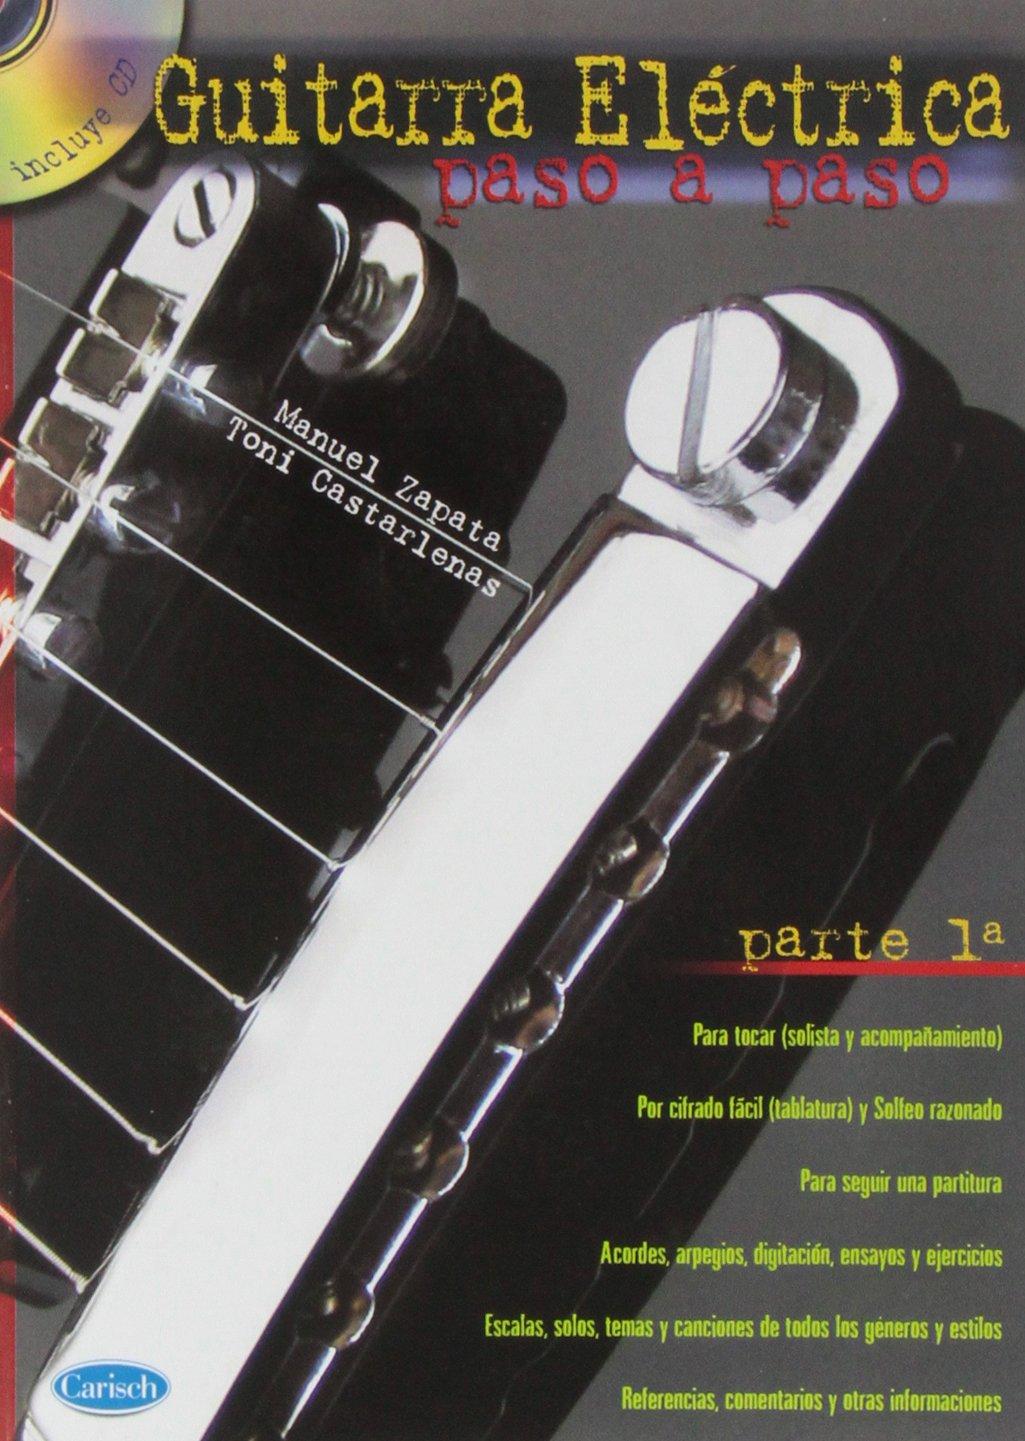 Guitarra Electrica Paso A Paso 1 (Castilian) Sheet music – 2006